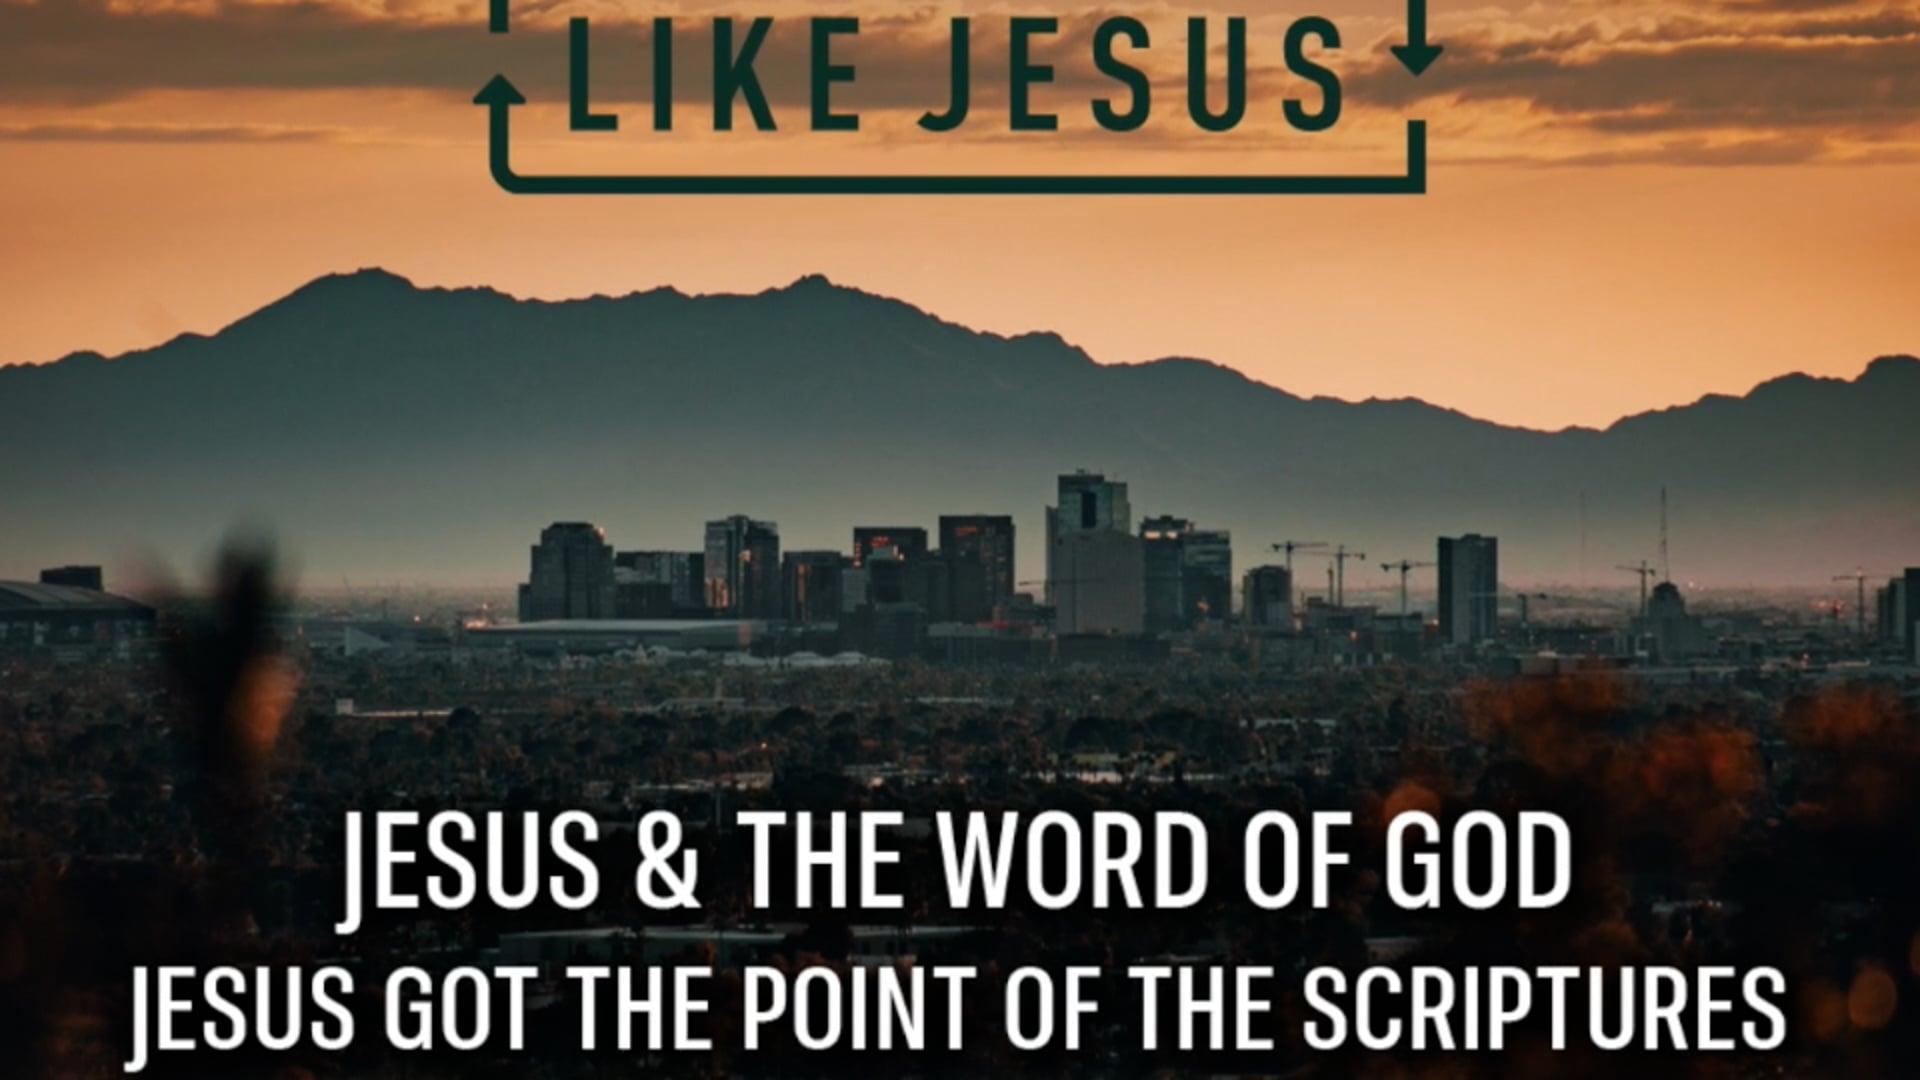 Jesus got the Point of Scriptures